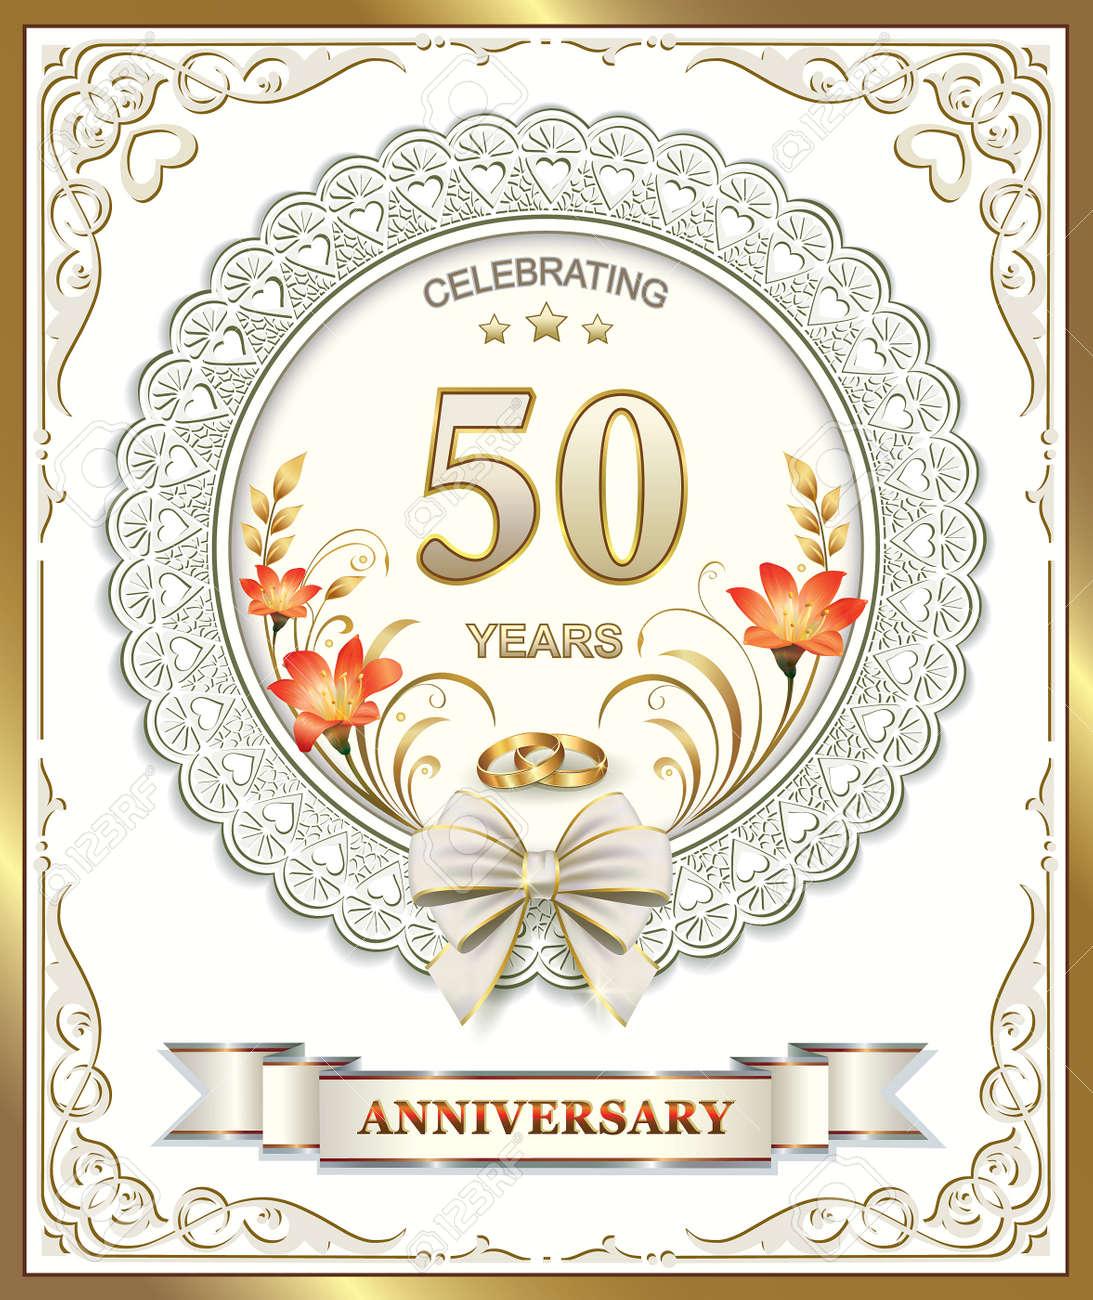 photo th wedding anniversary 50th wedding anniversary 50th wedding anniversary Stock Vector